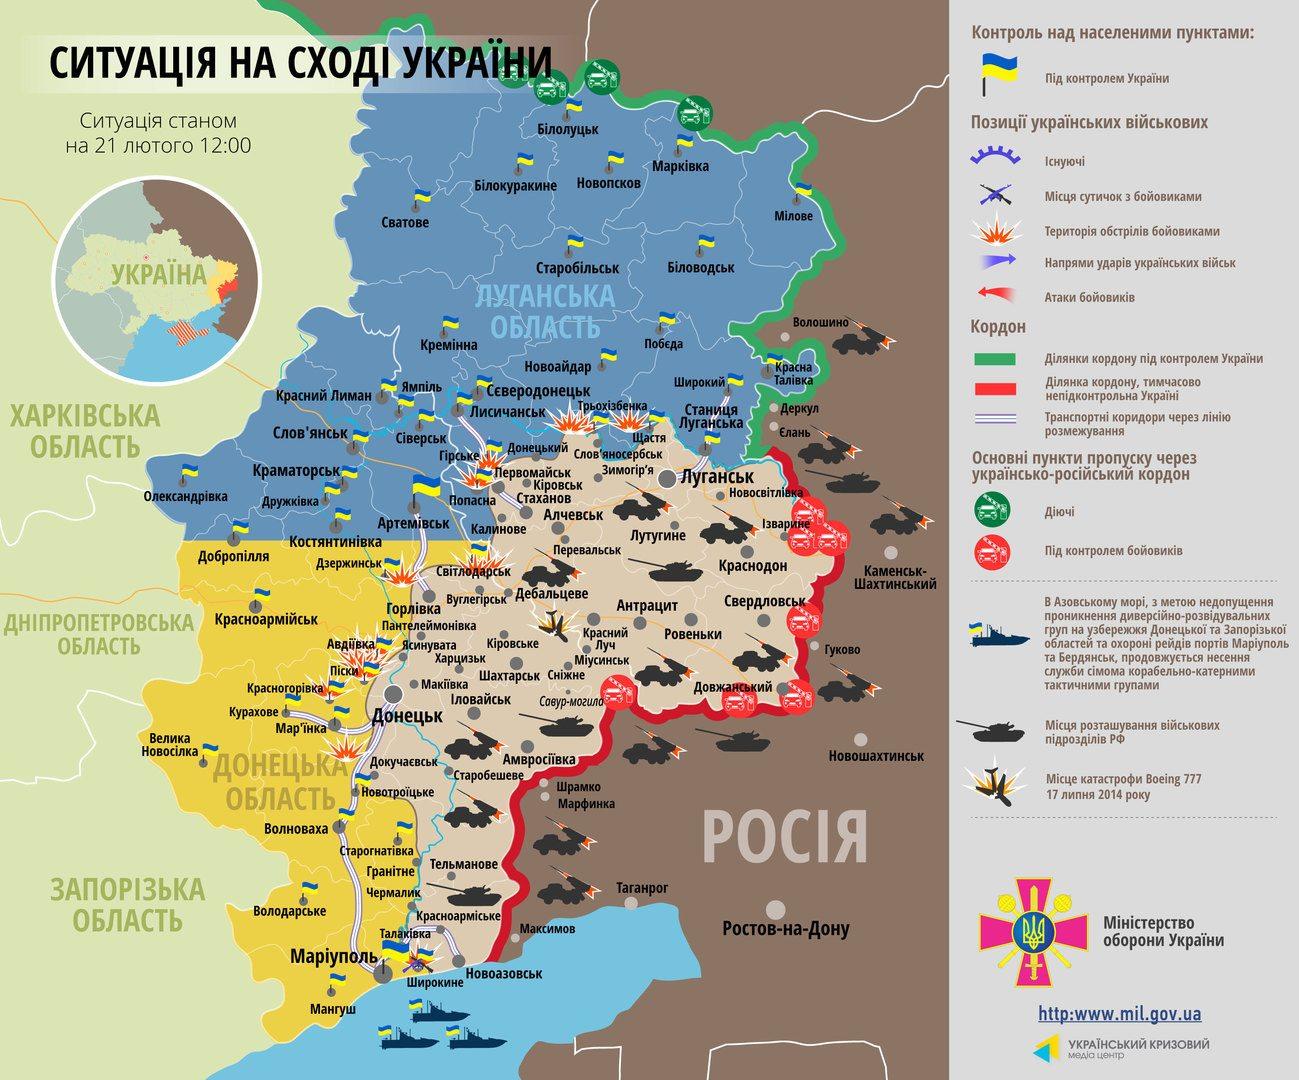 http://ck.ridna.ua/wp-content/uploads/2015/02/282732314fb285594cf4ba43181f1369.jpg